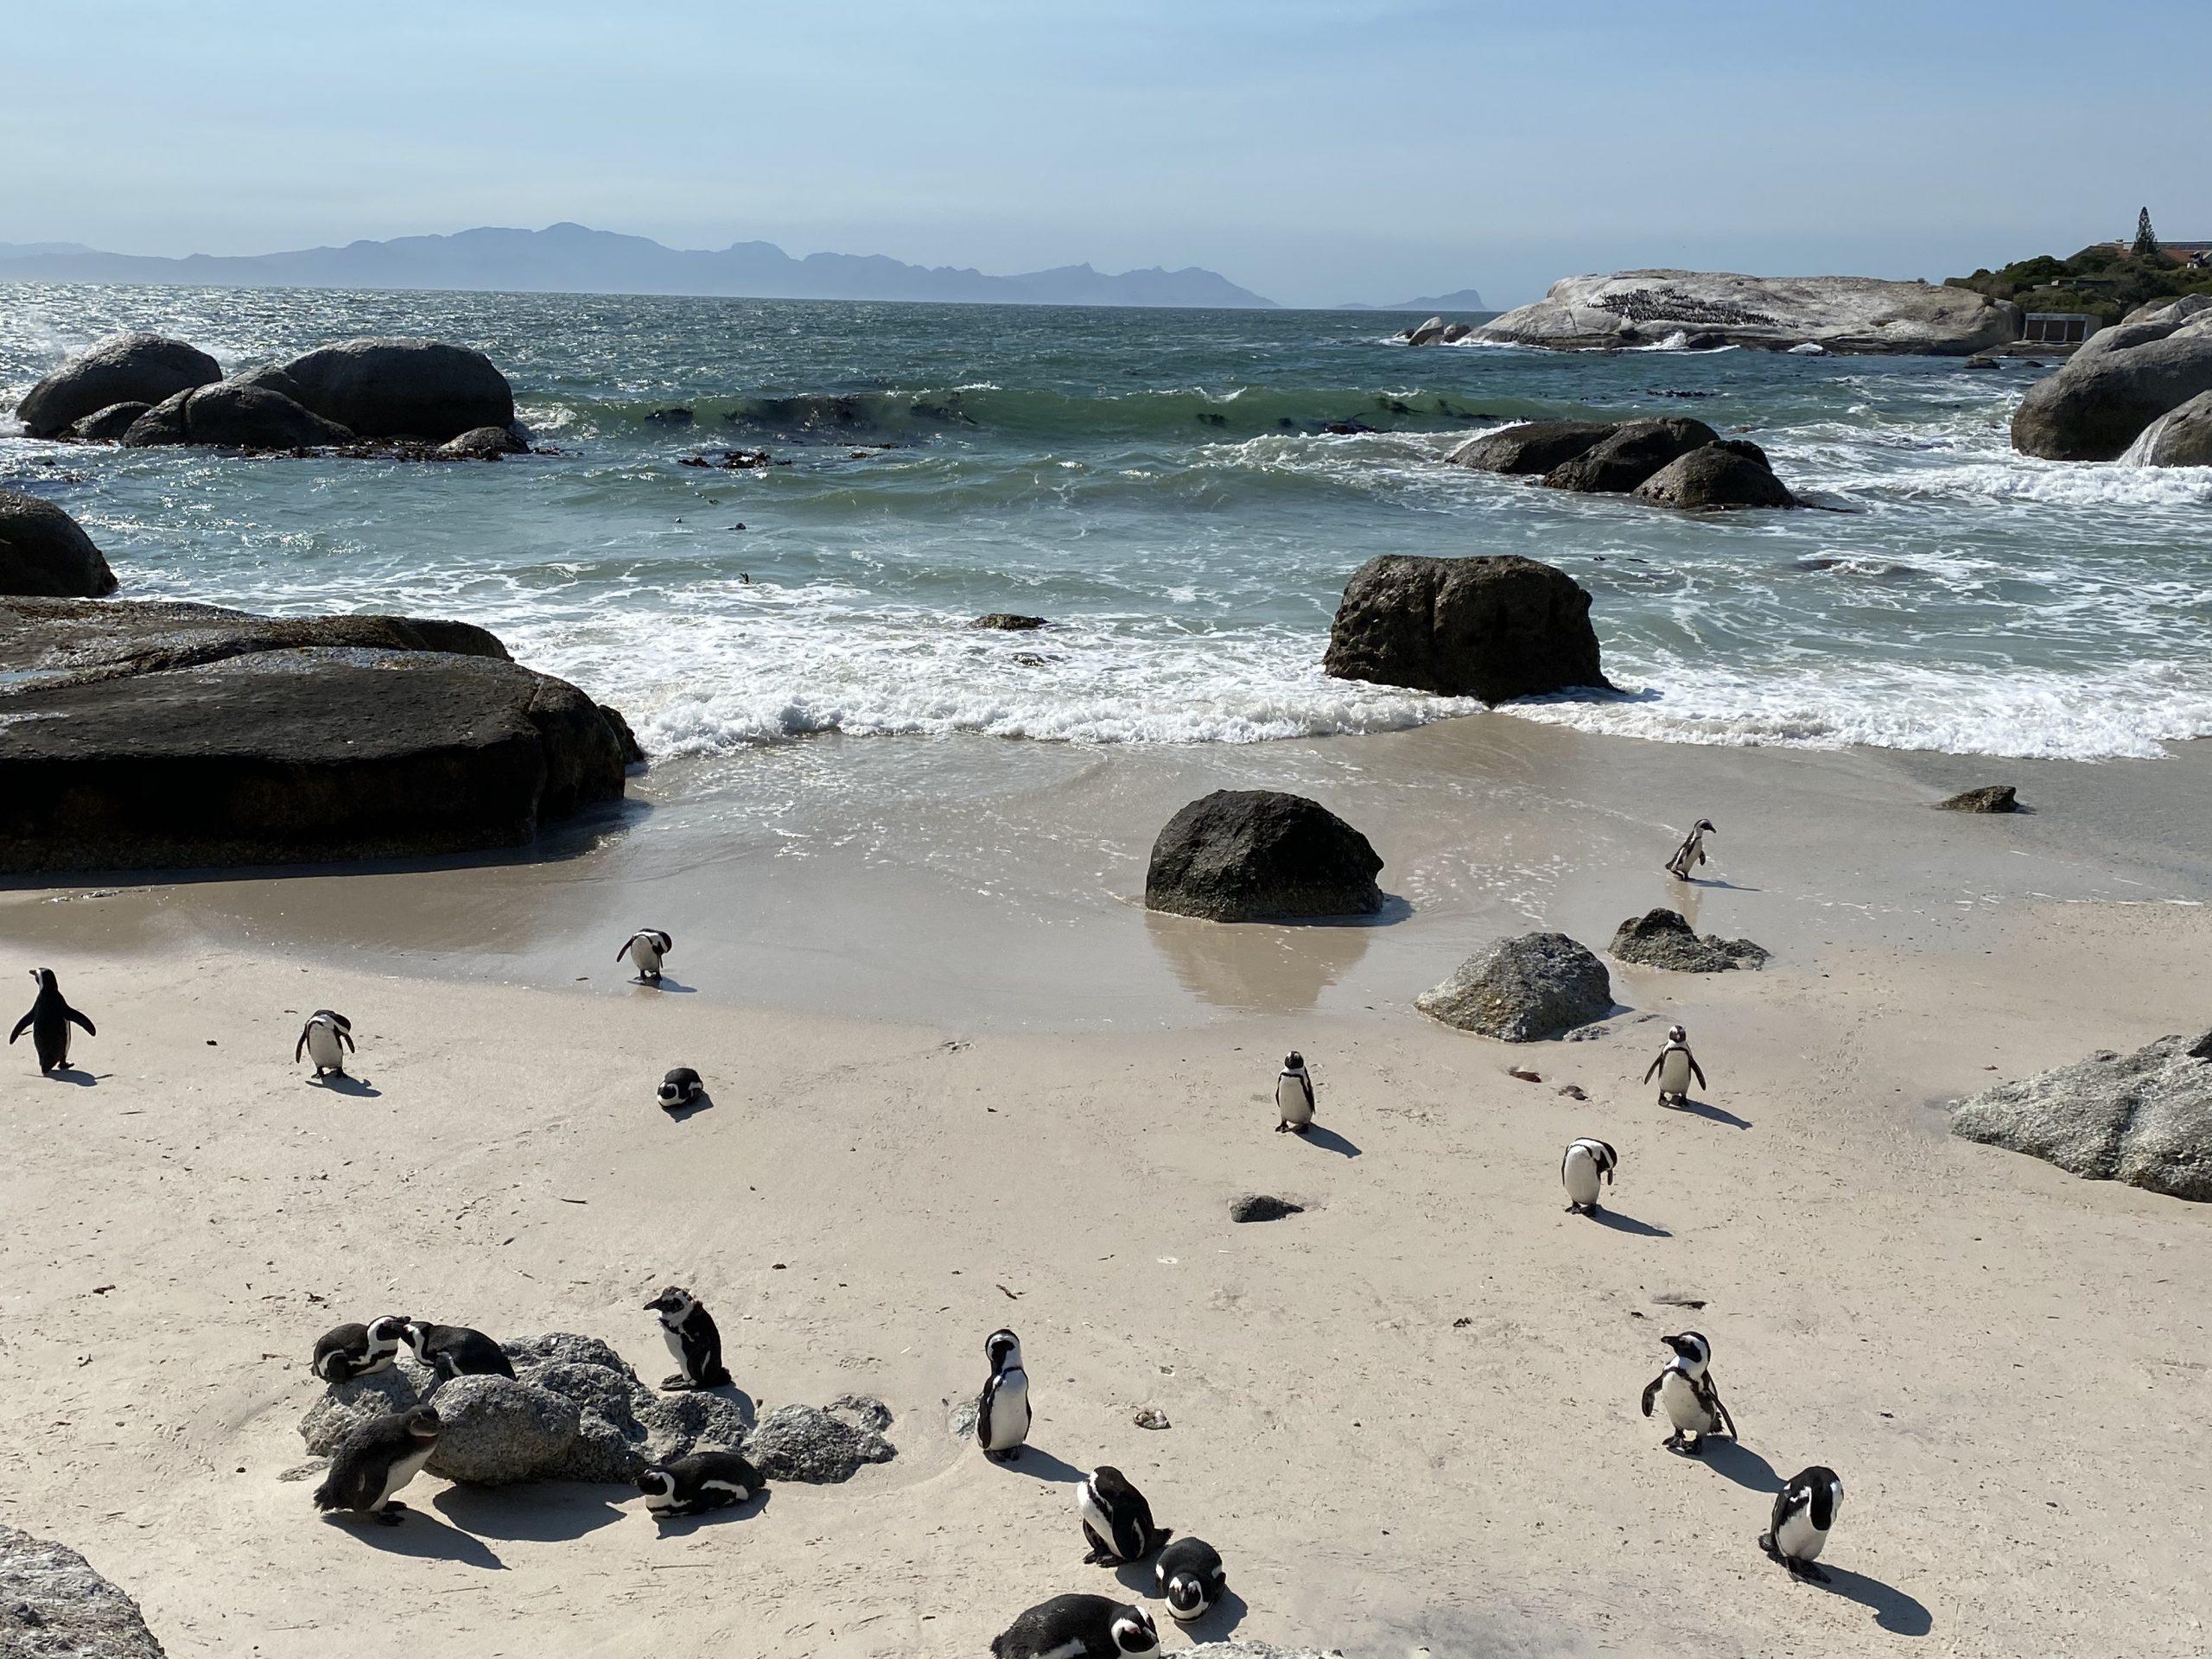 Cape Town. Photo: Liran Hadashi